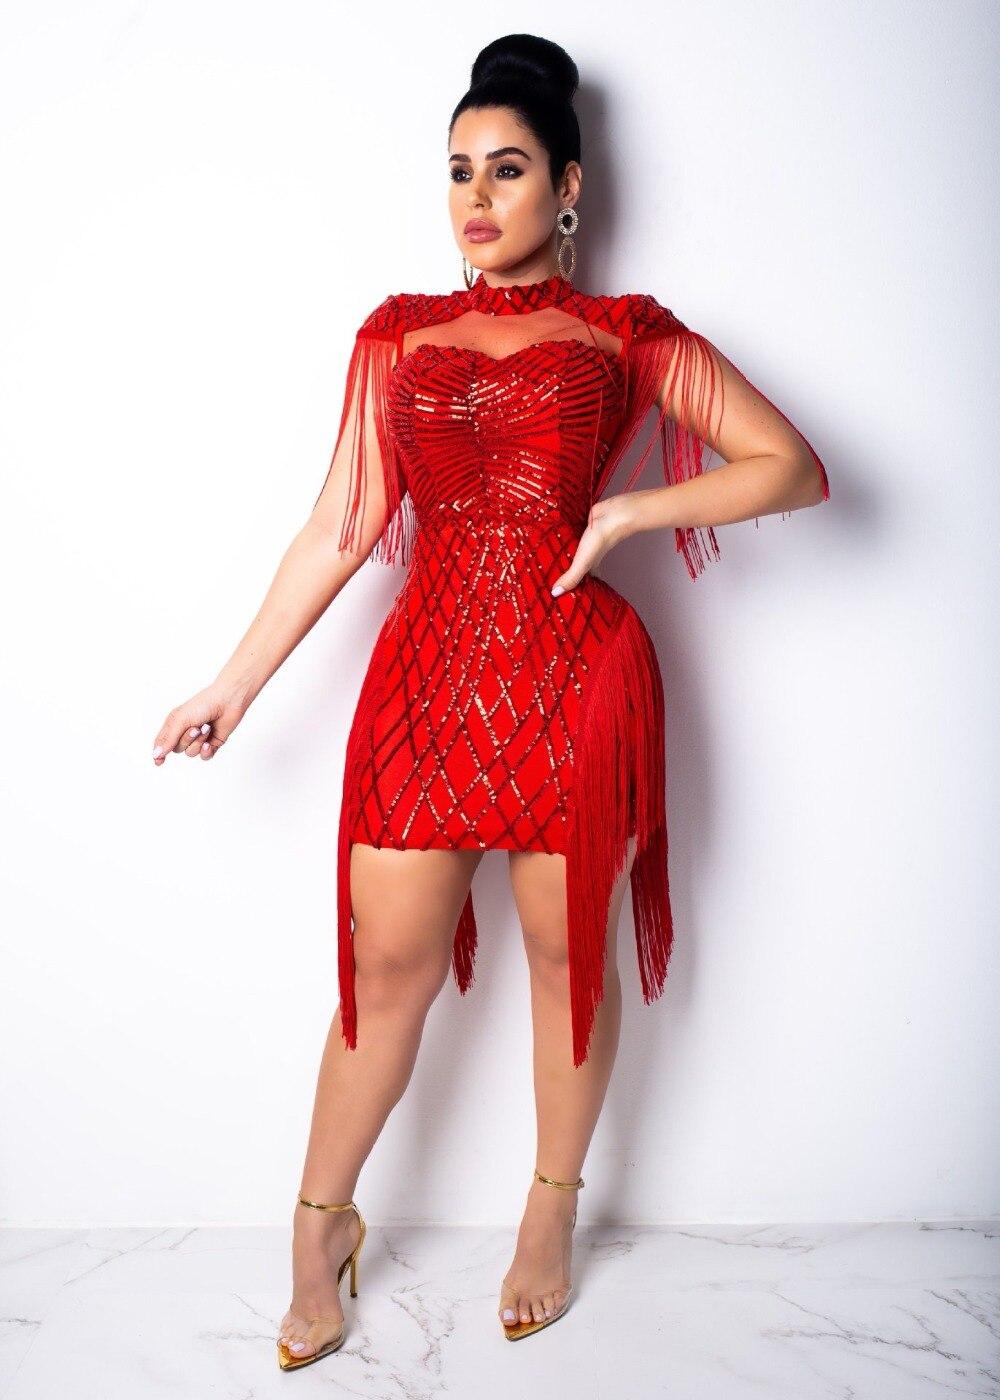 Plus Size Vestido De Autumn Festa Top Fashion Real Dress Women's Free Shipping 2019 European And American Sexy Sequin Nightclub